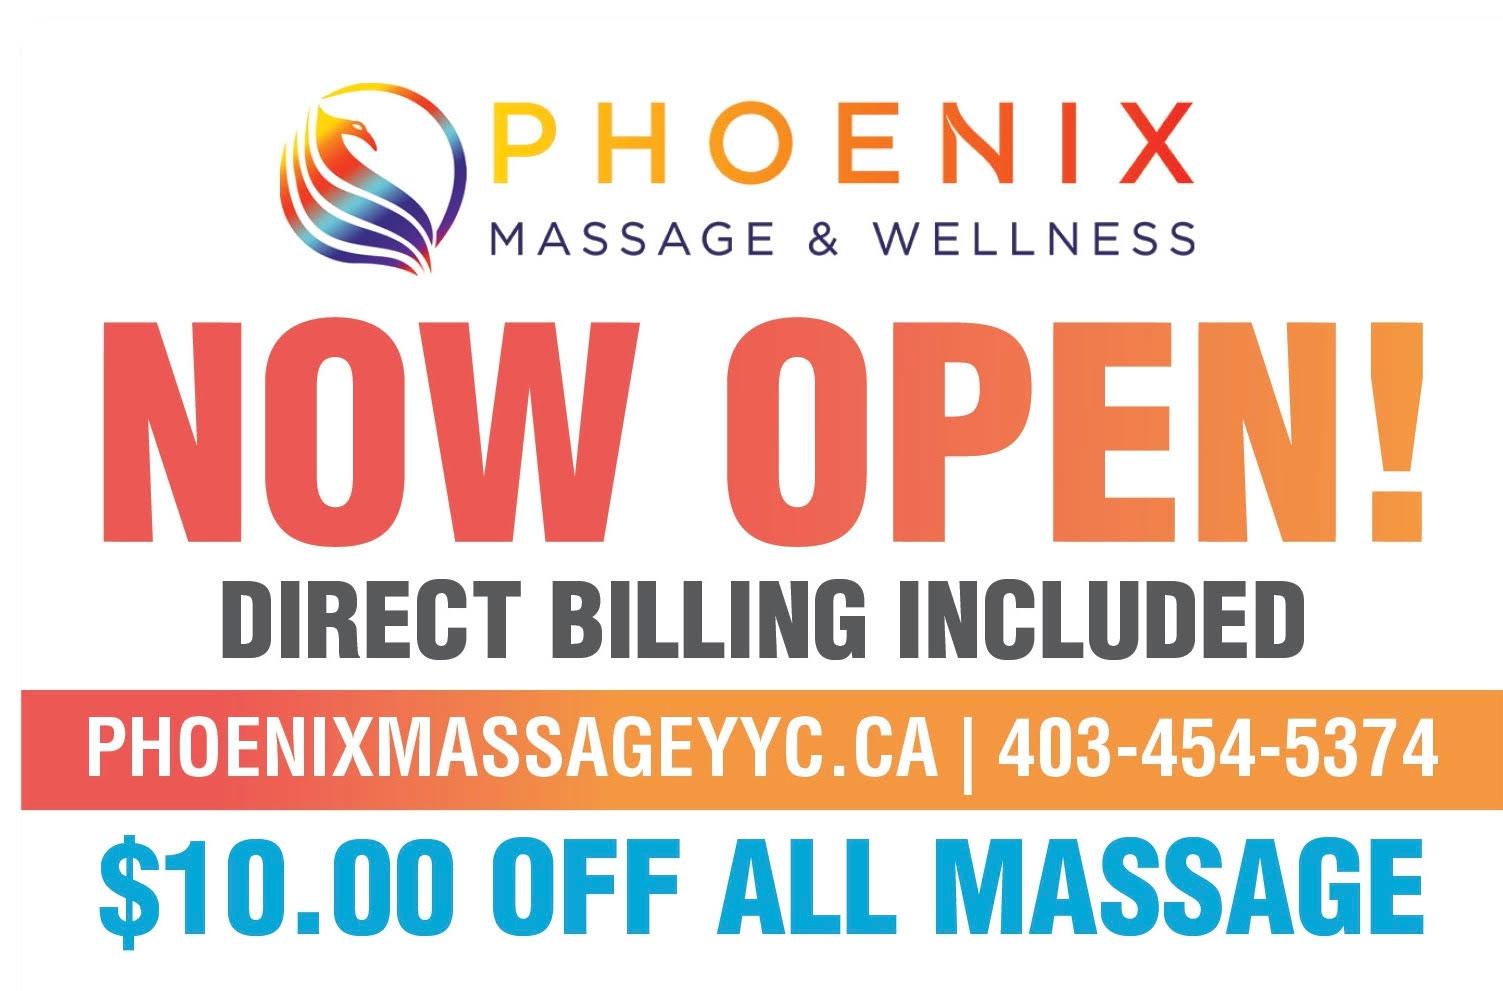 $10.00 Off All Massage